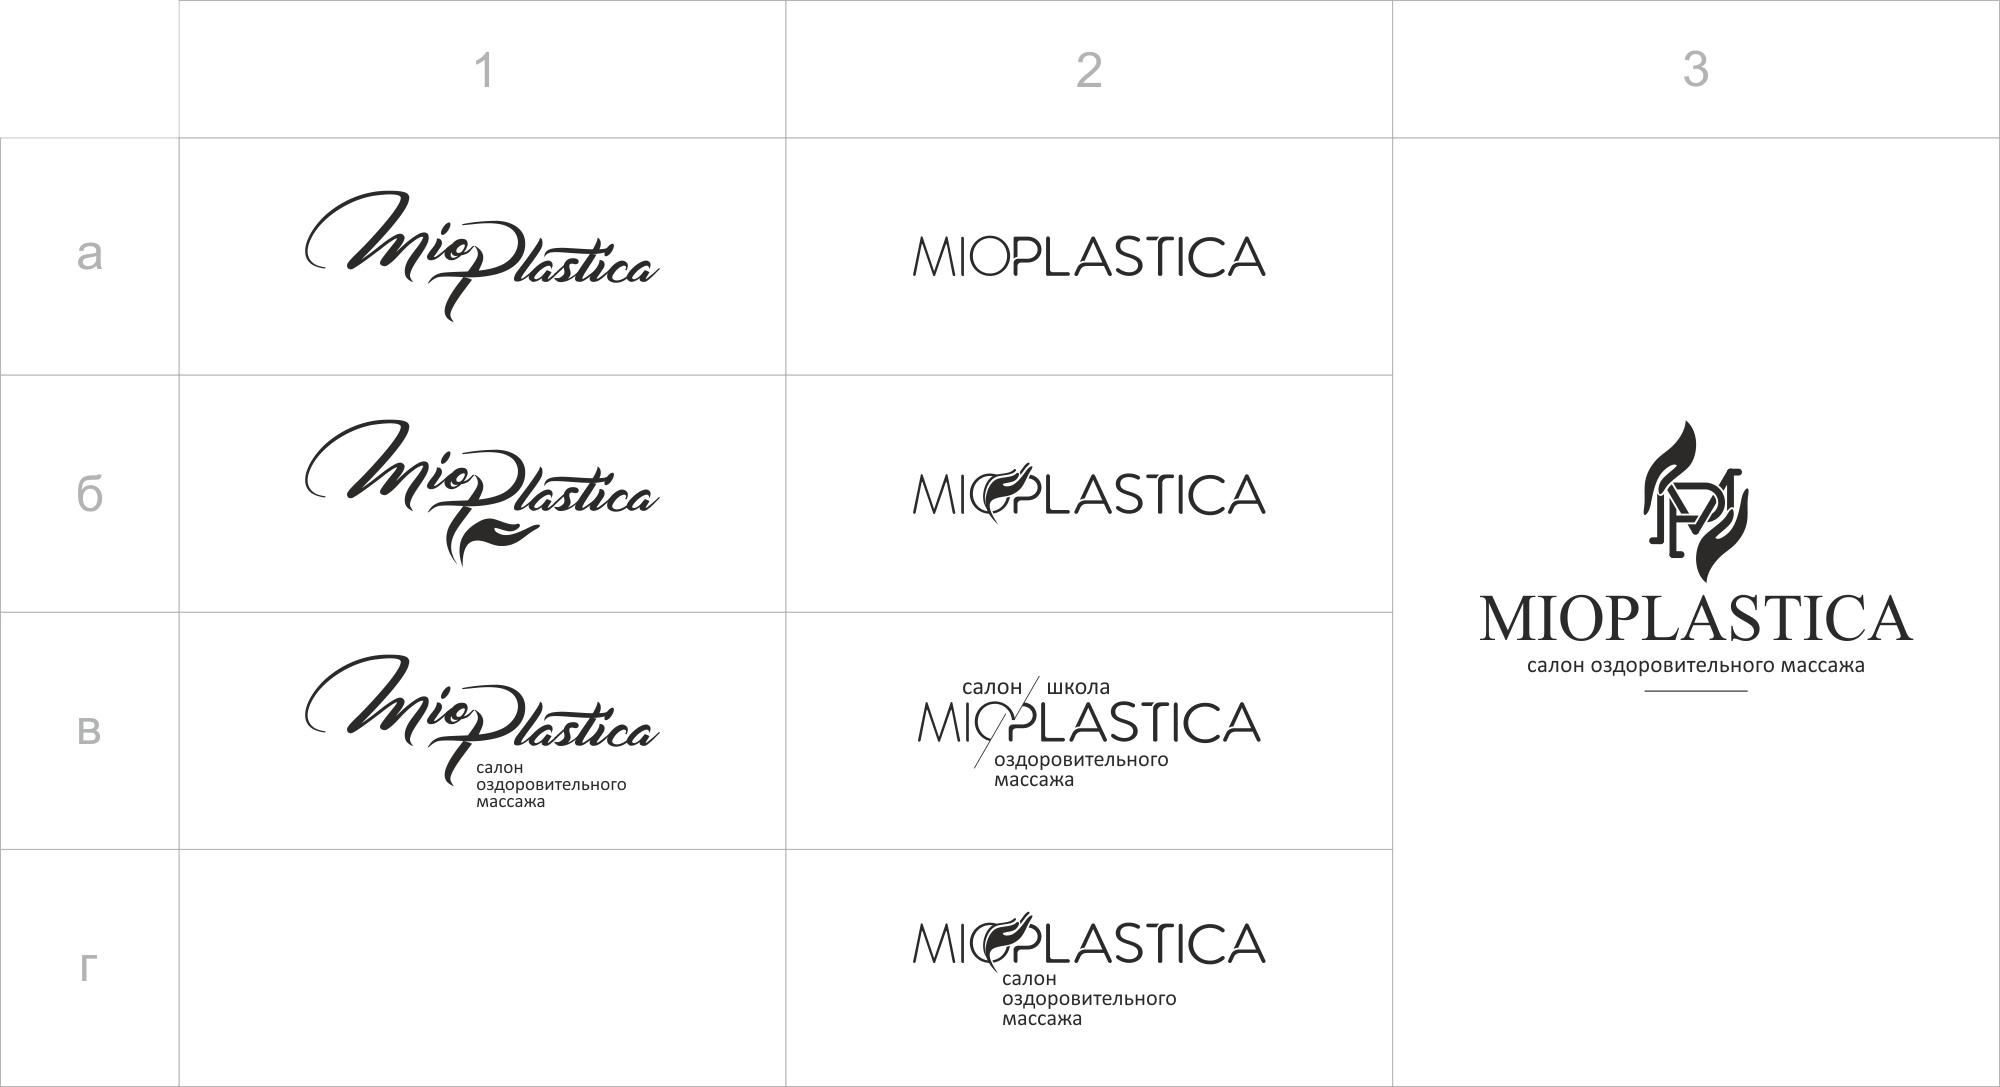 Наброски логотипа Миопластика